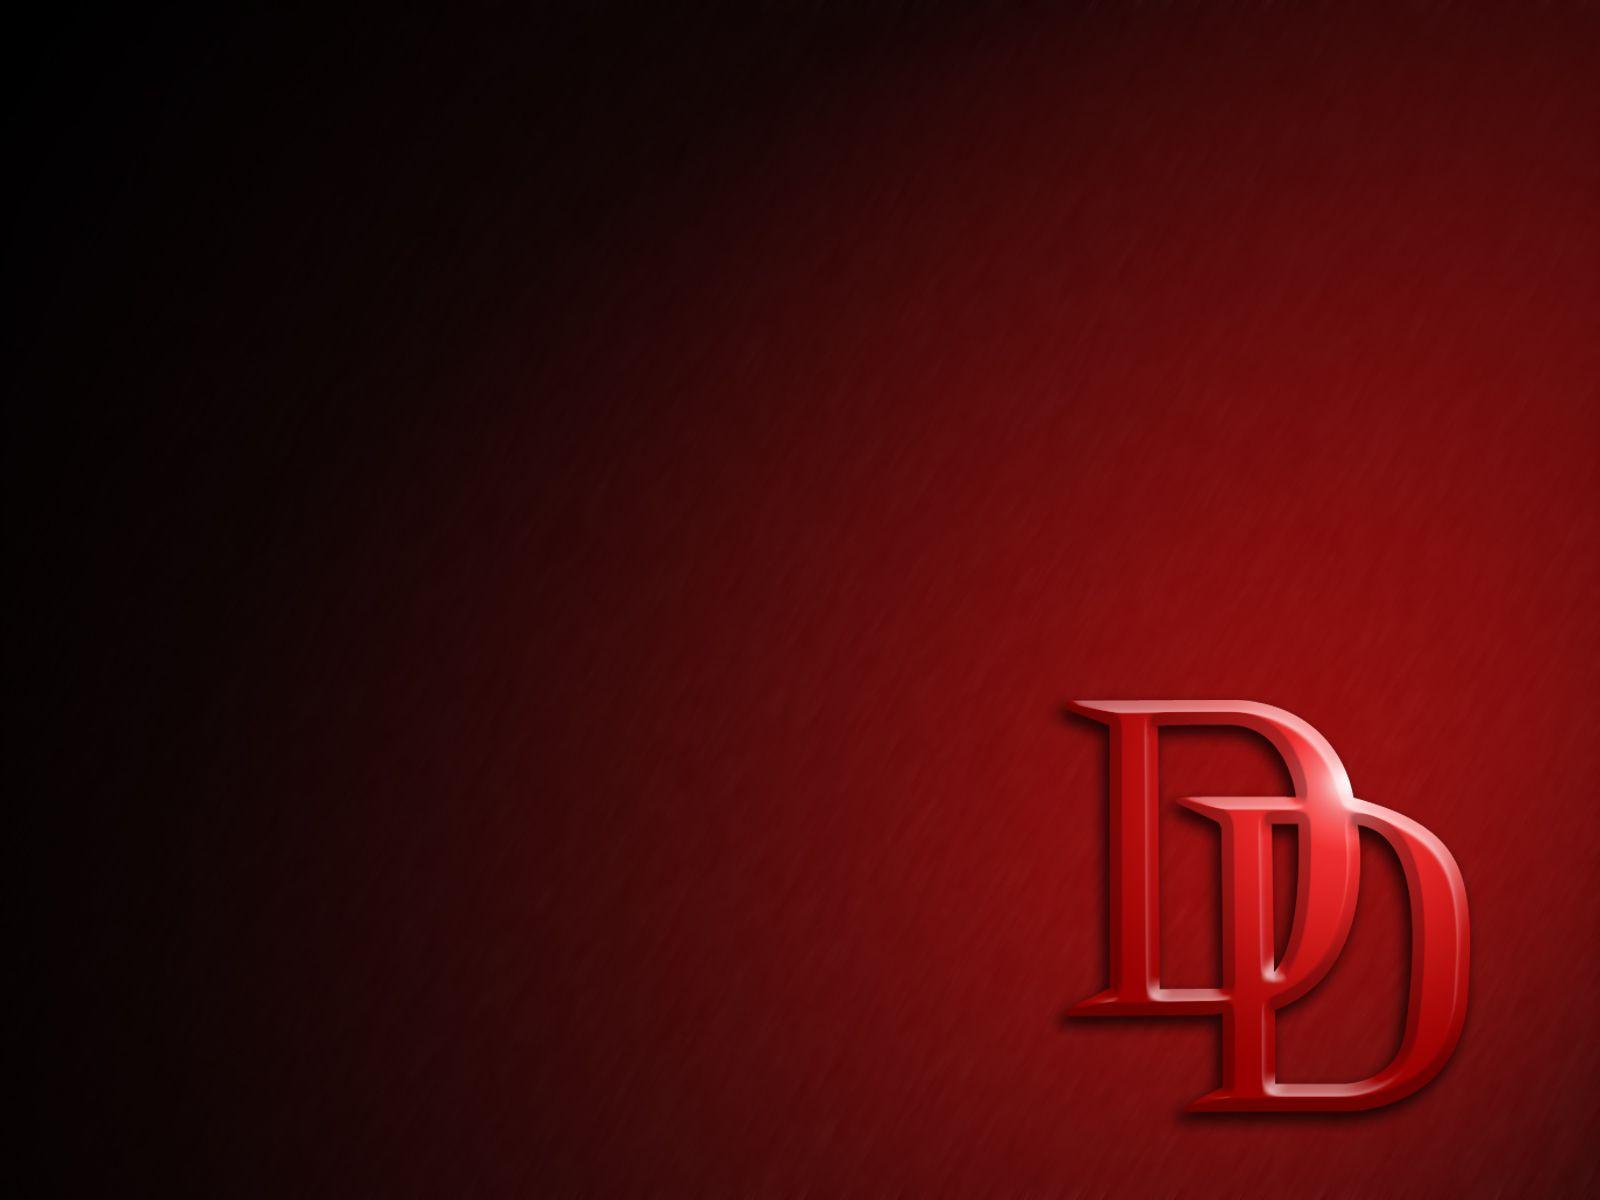 Daredevil Symbol - Comics Photography Desktop Wallpapers